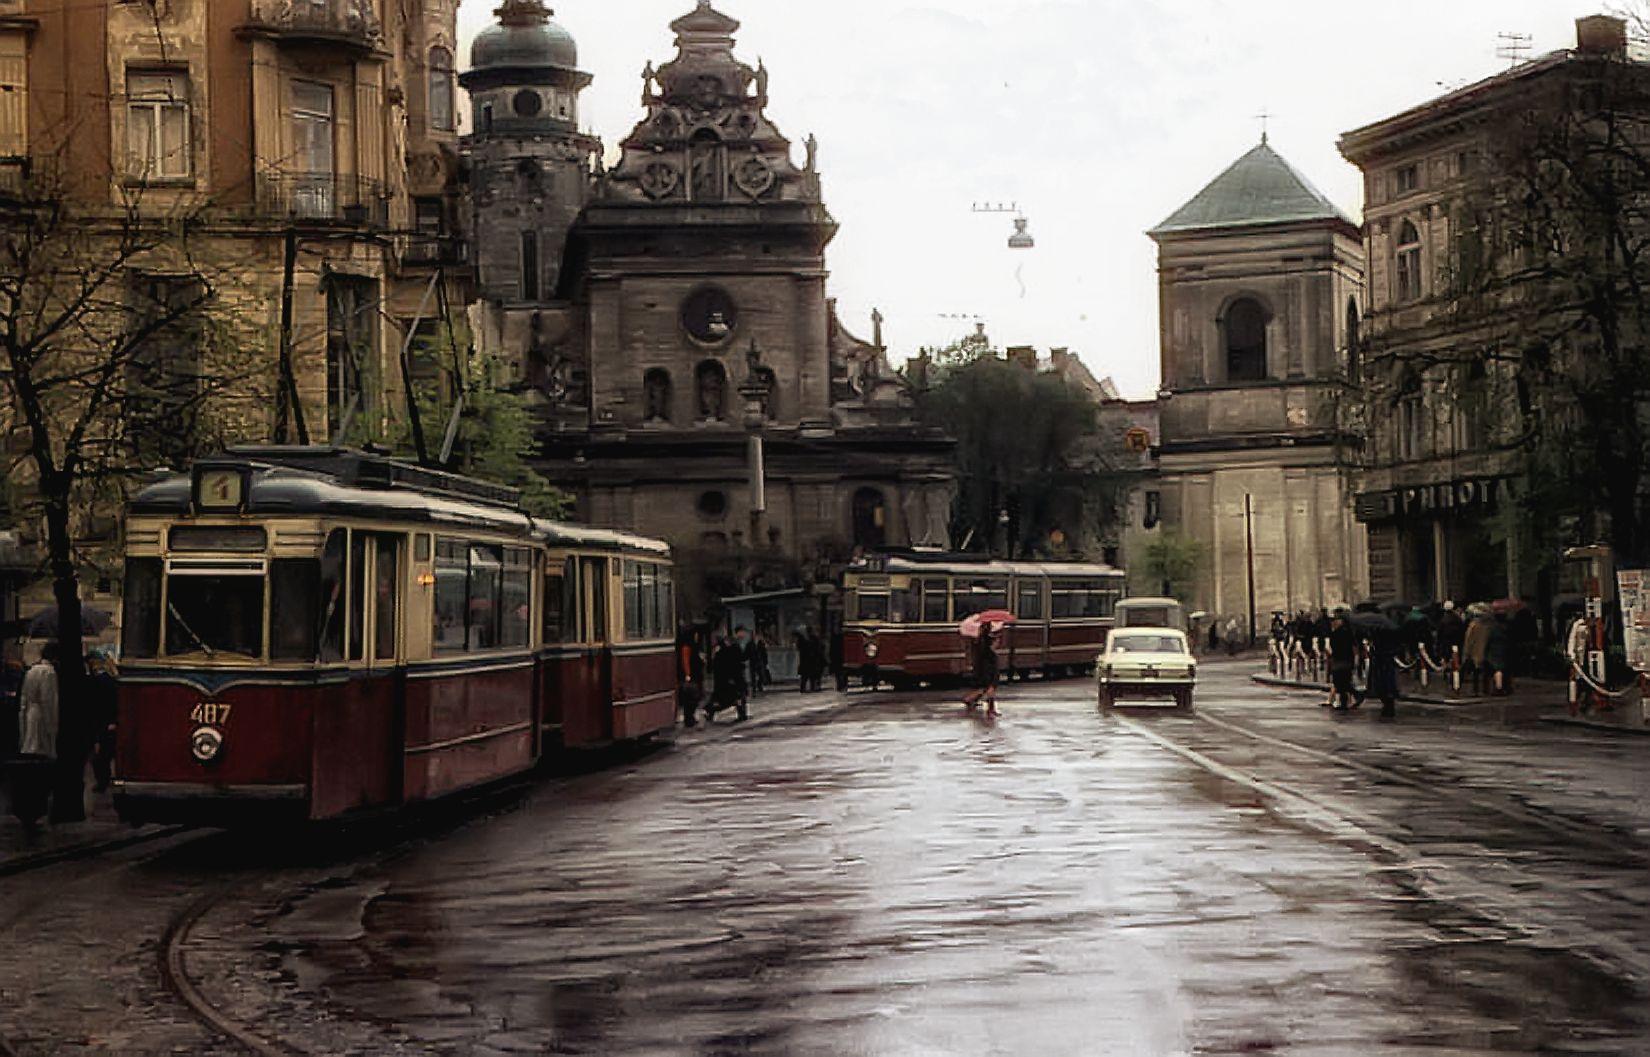 Старий Львів © Ааре Оландер